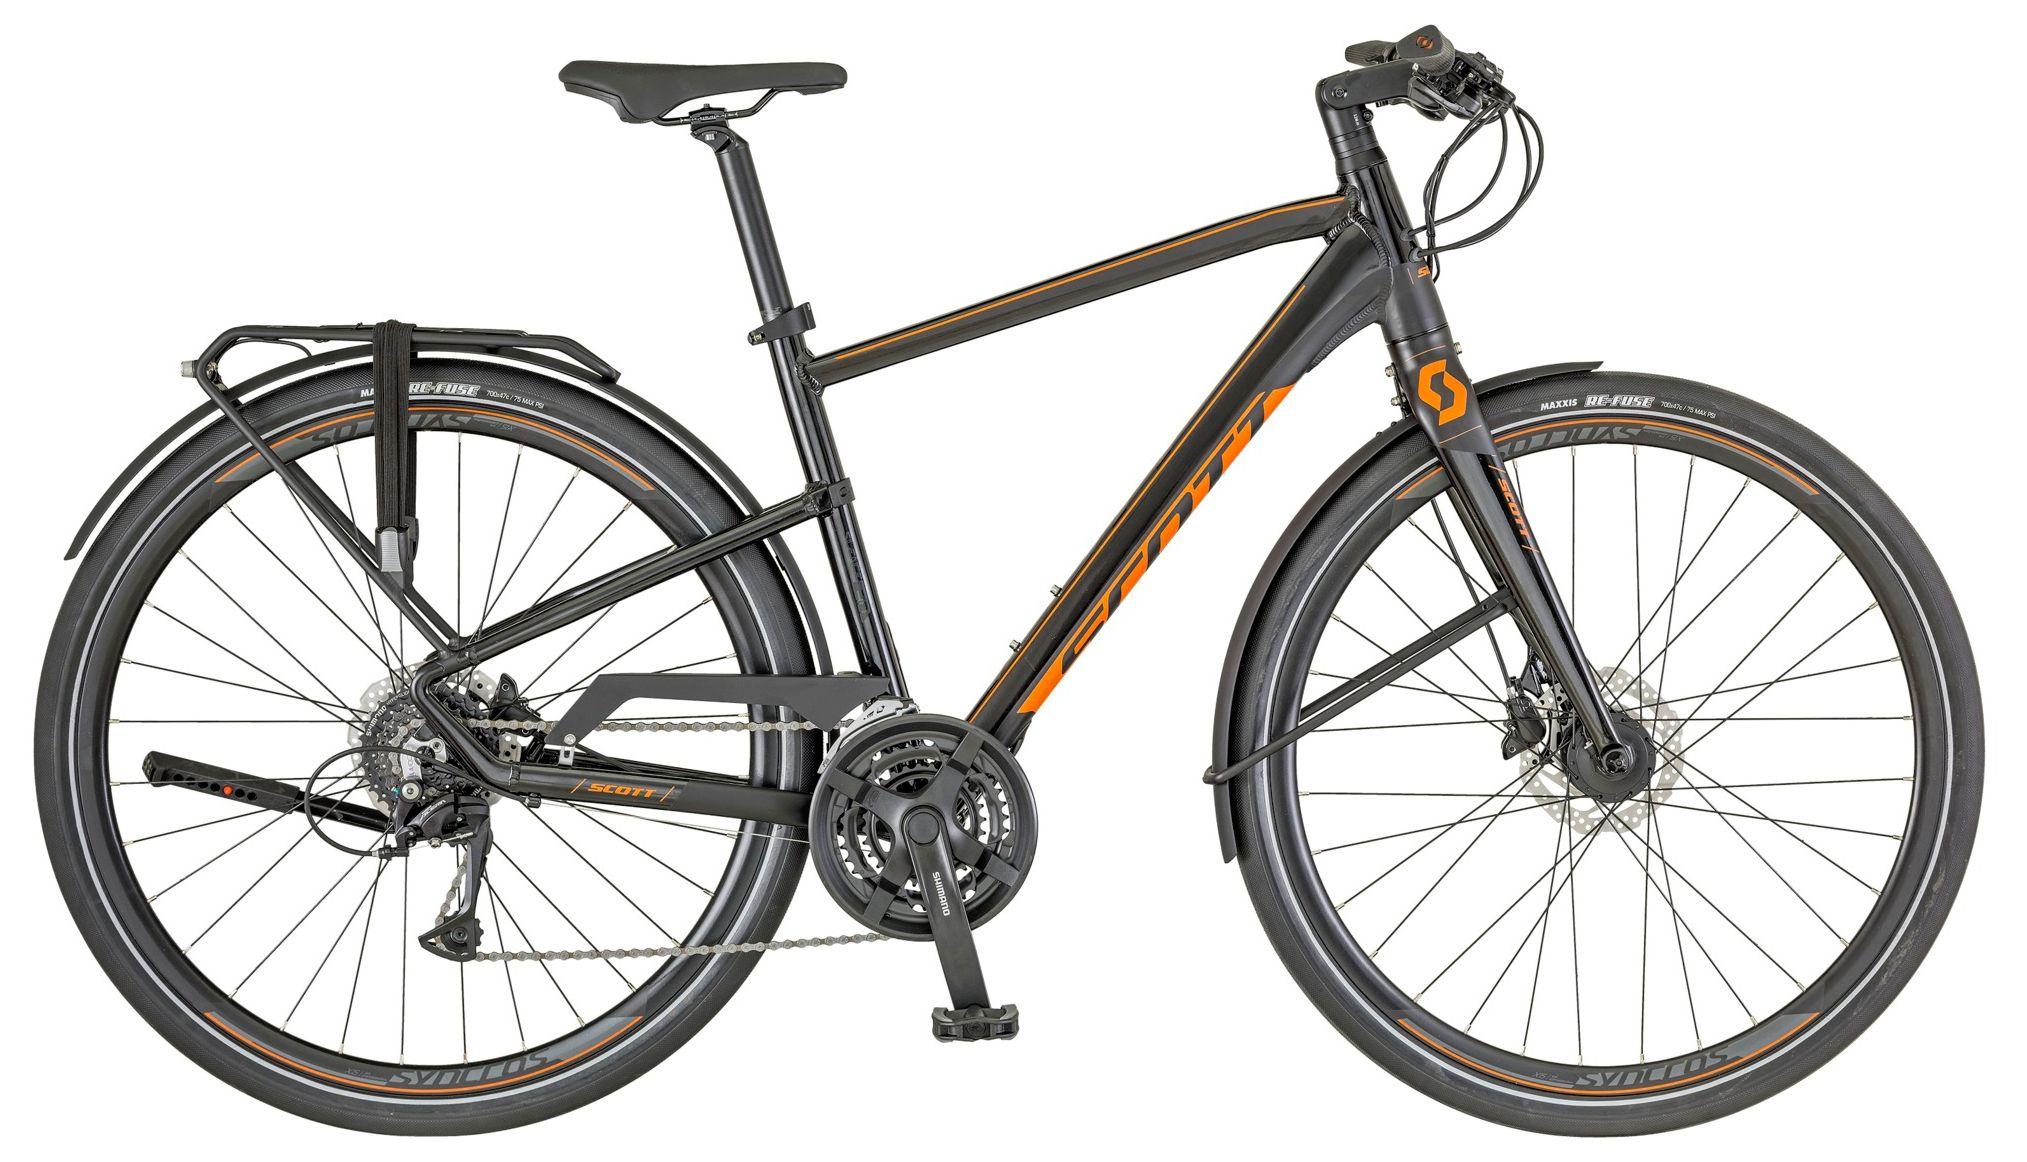 Велосипед Scott Silence 30 Men 2018 велосипед scott contessa solace 15 compact 2015